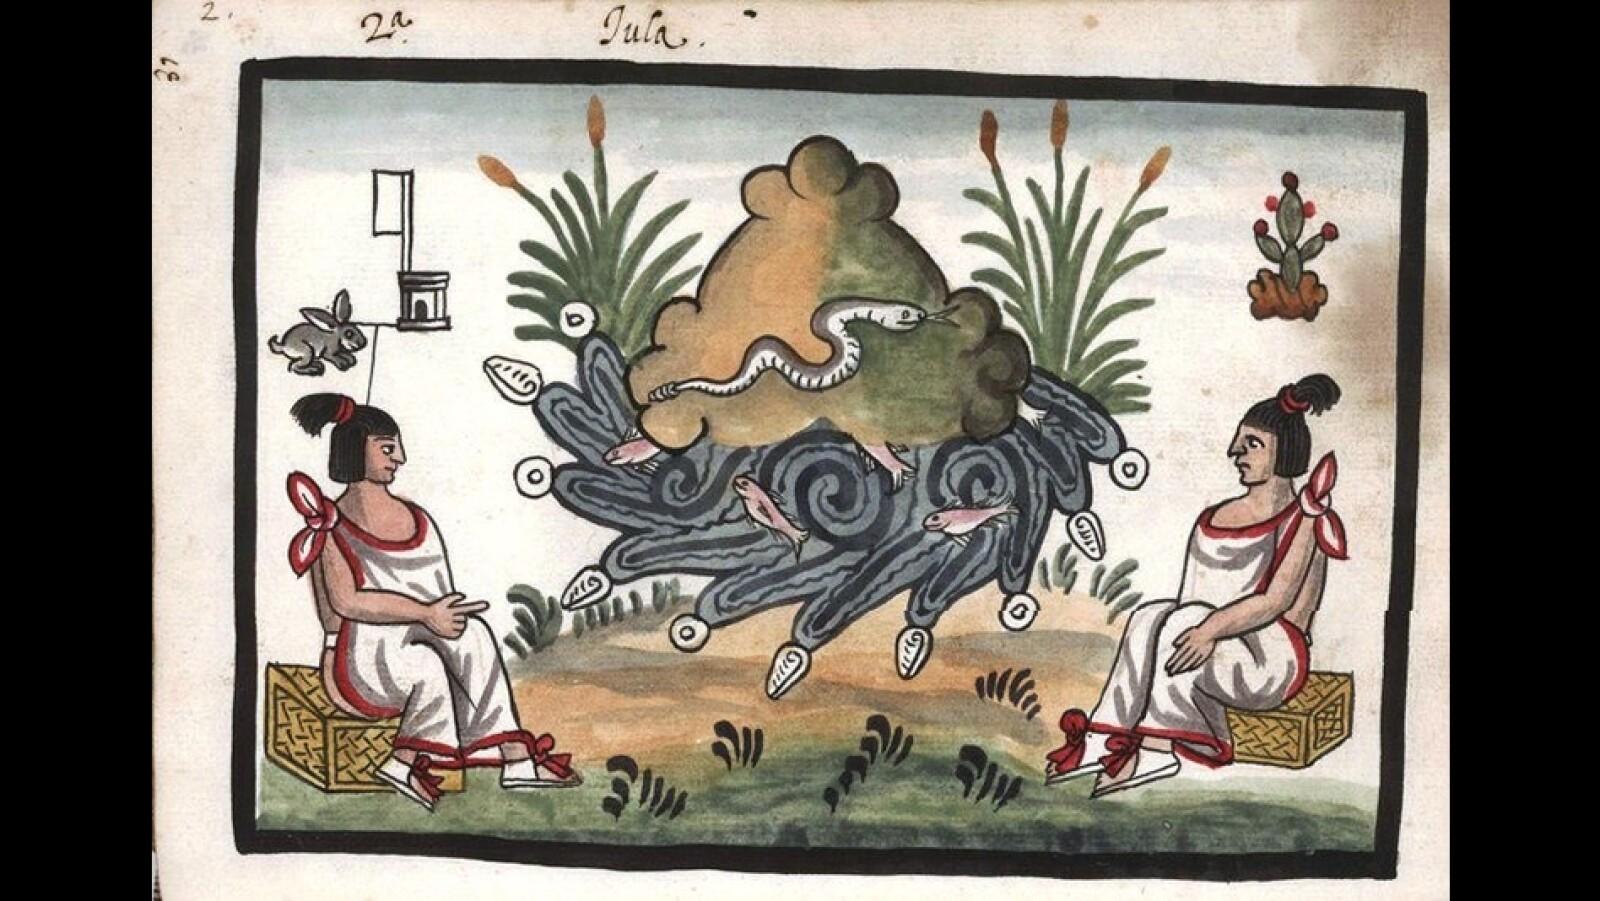 Huitzilopochtli nacimiento 2